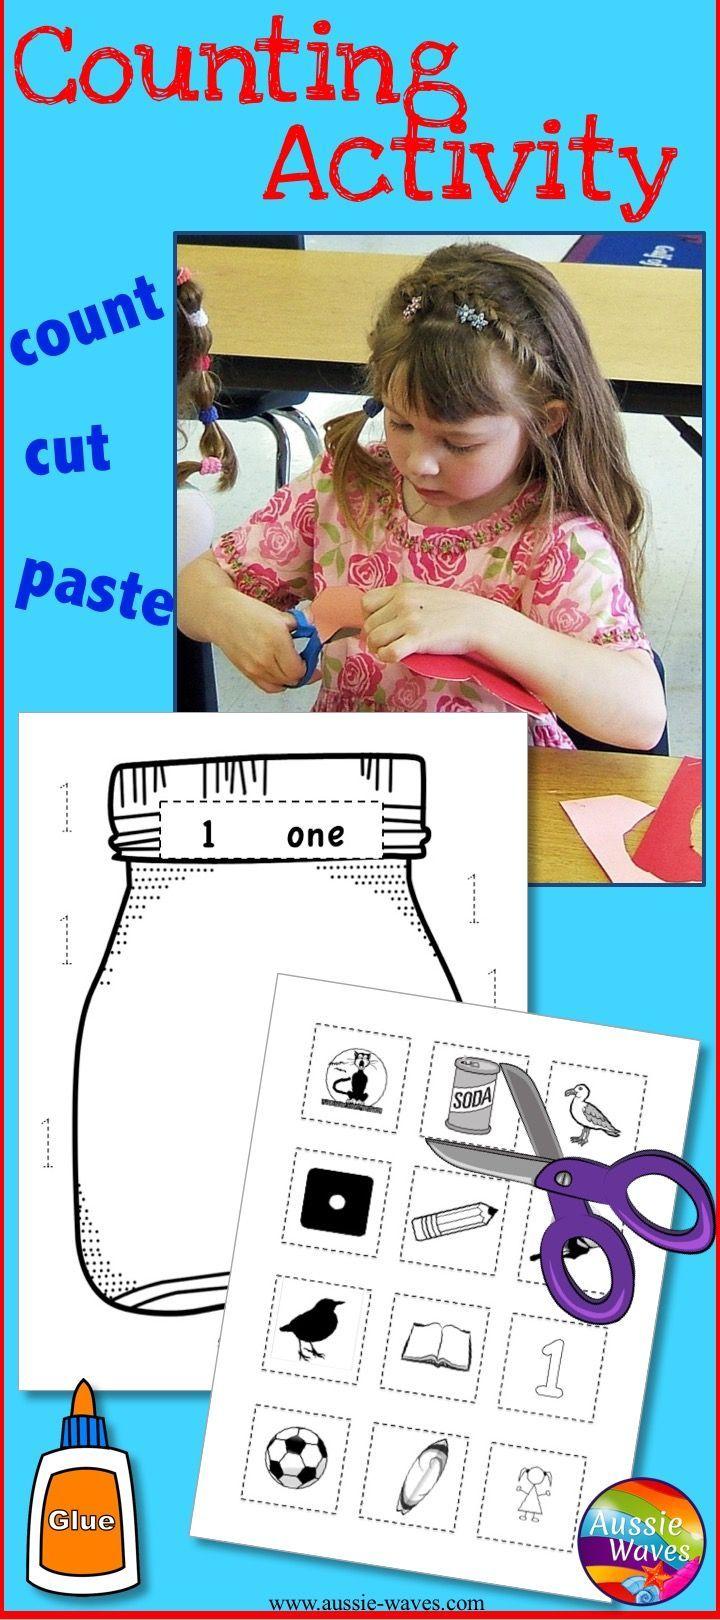 Count, cut paste activity for Math centers.